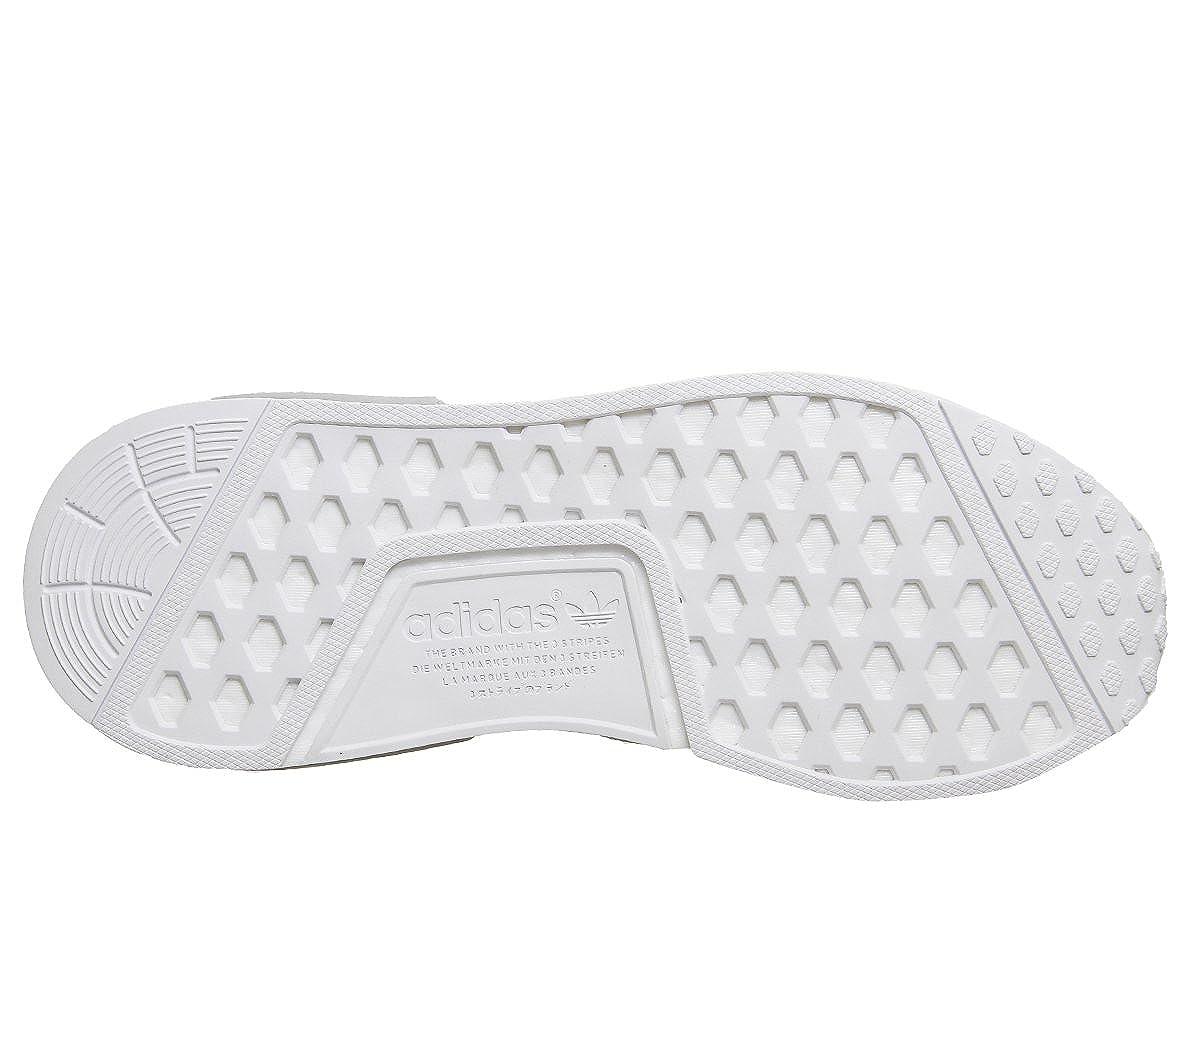 Adidas Herren NMD_xr1 NMD_xr1 NMD_xr1 Winter Fitnessschuhe rot B071K7X8FQ  3031e1